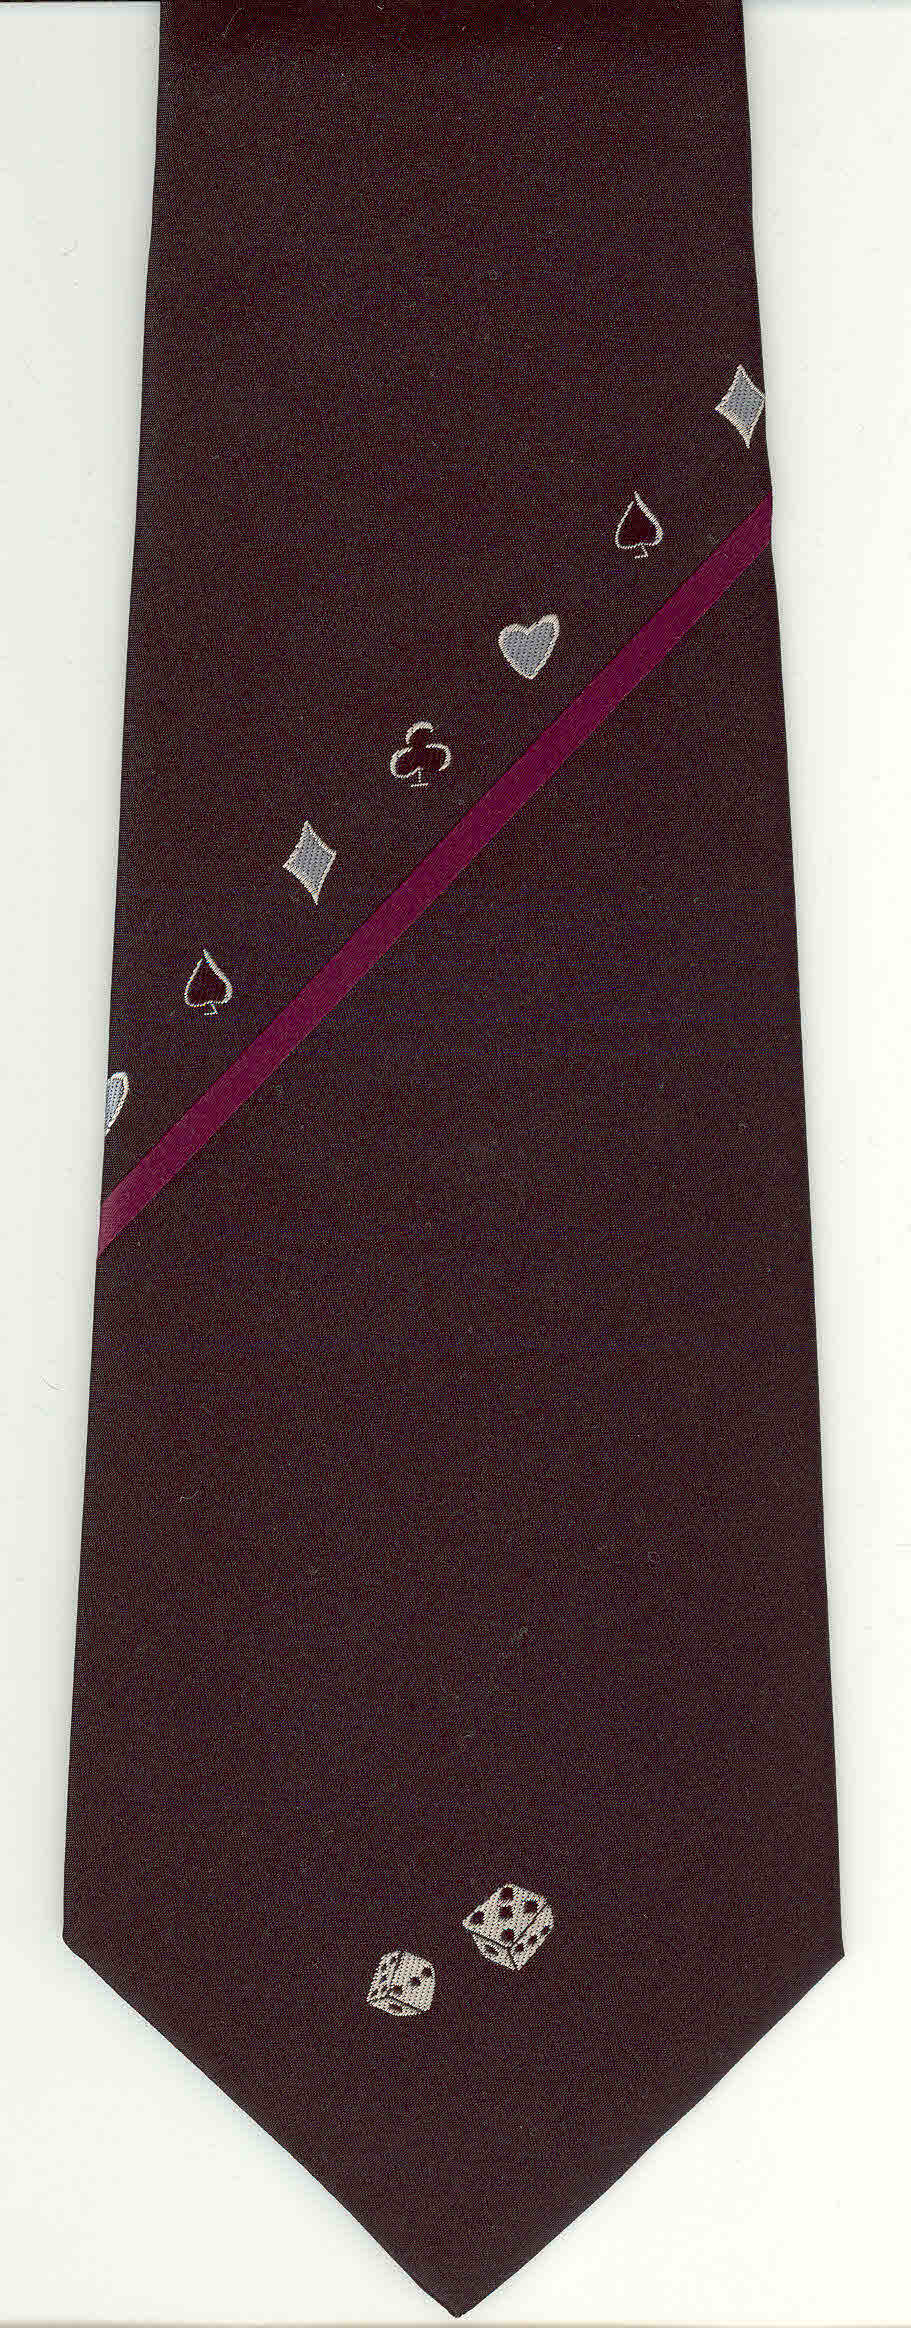 041 NM Suits & Dice.jpg